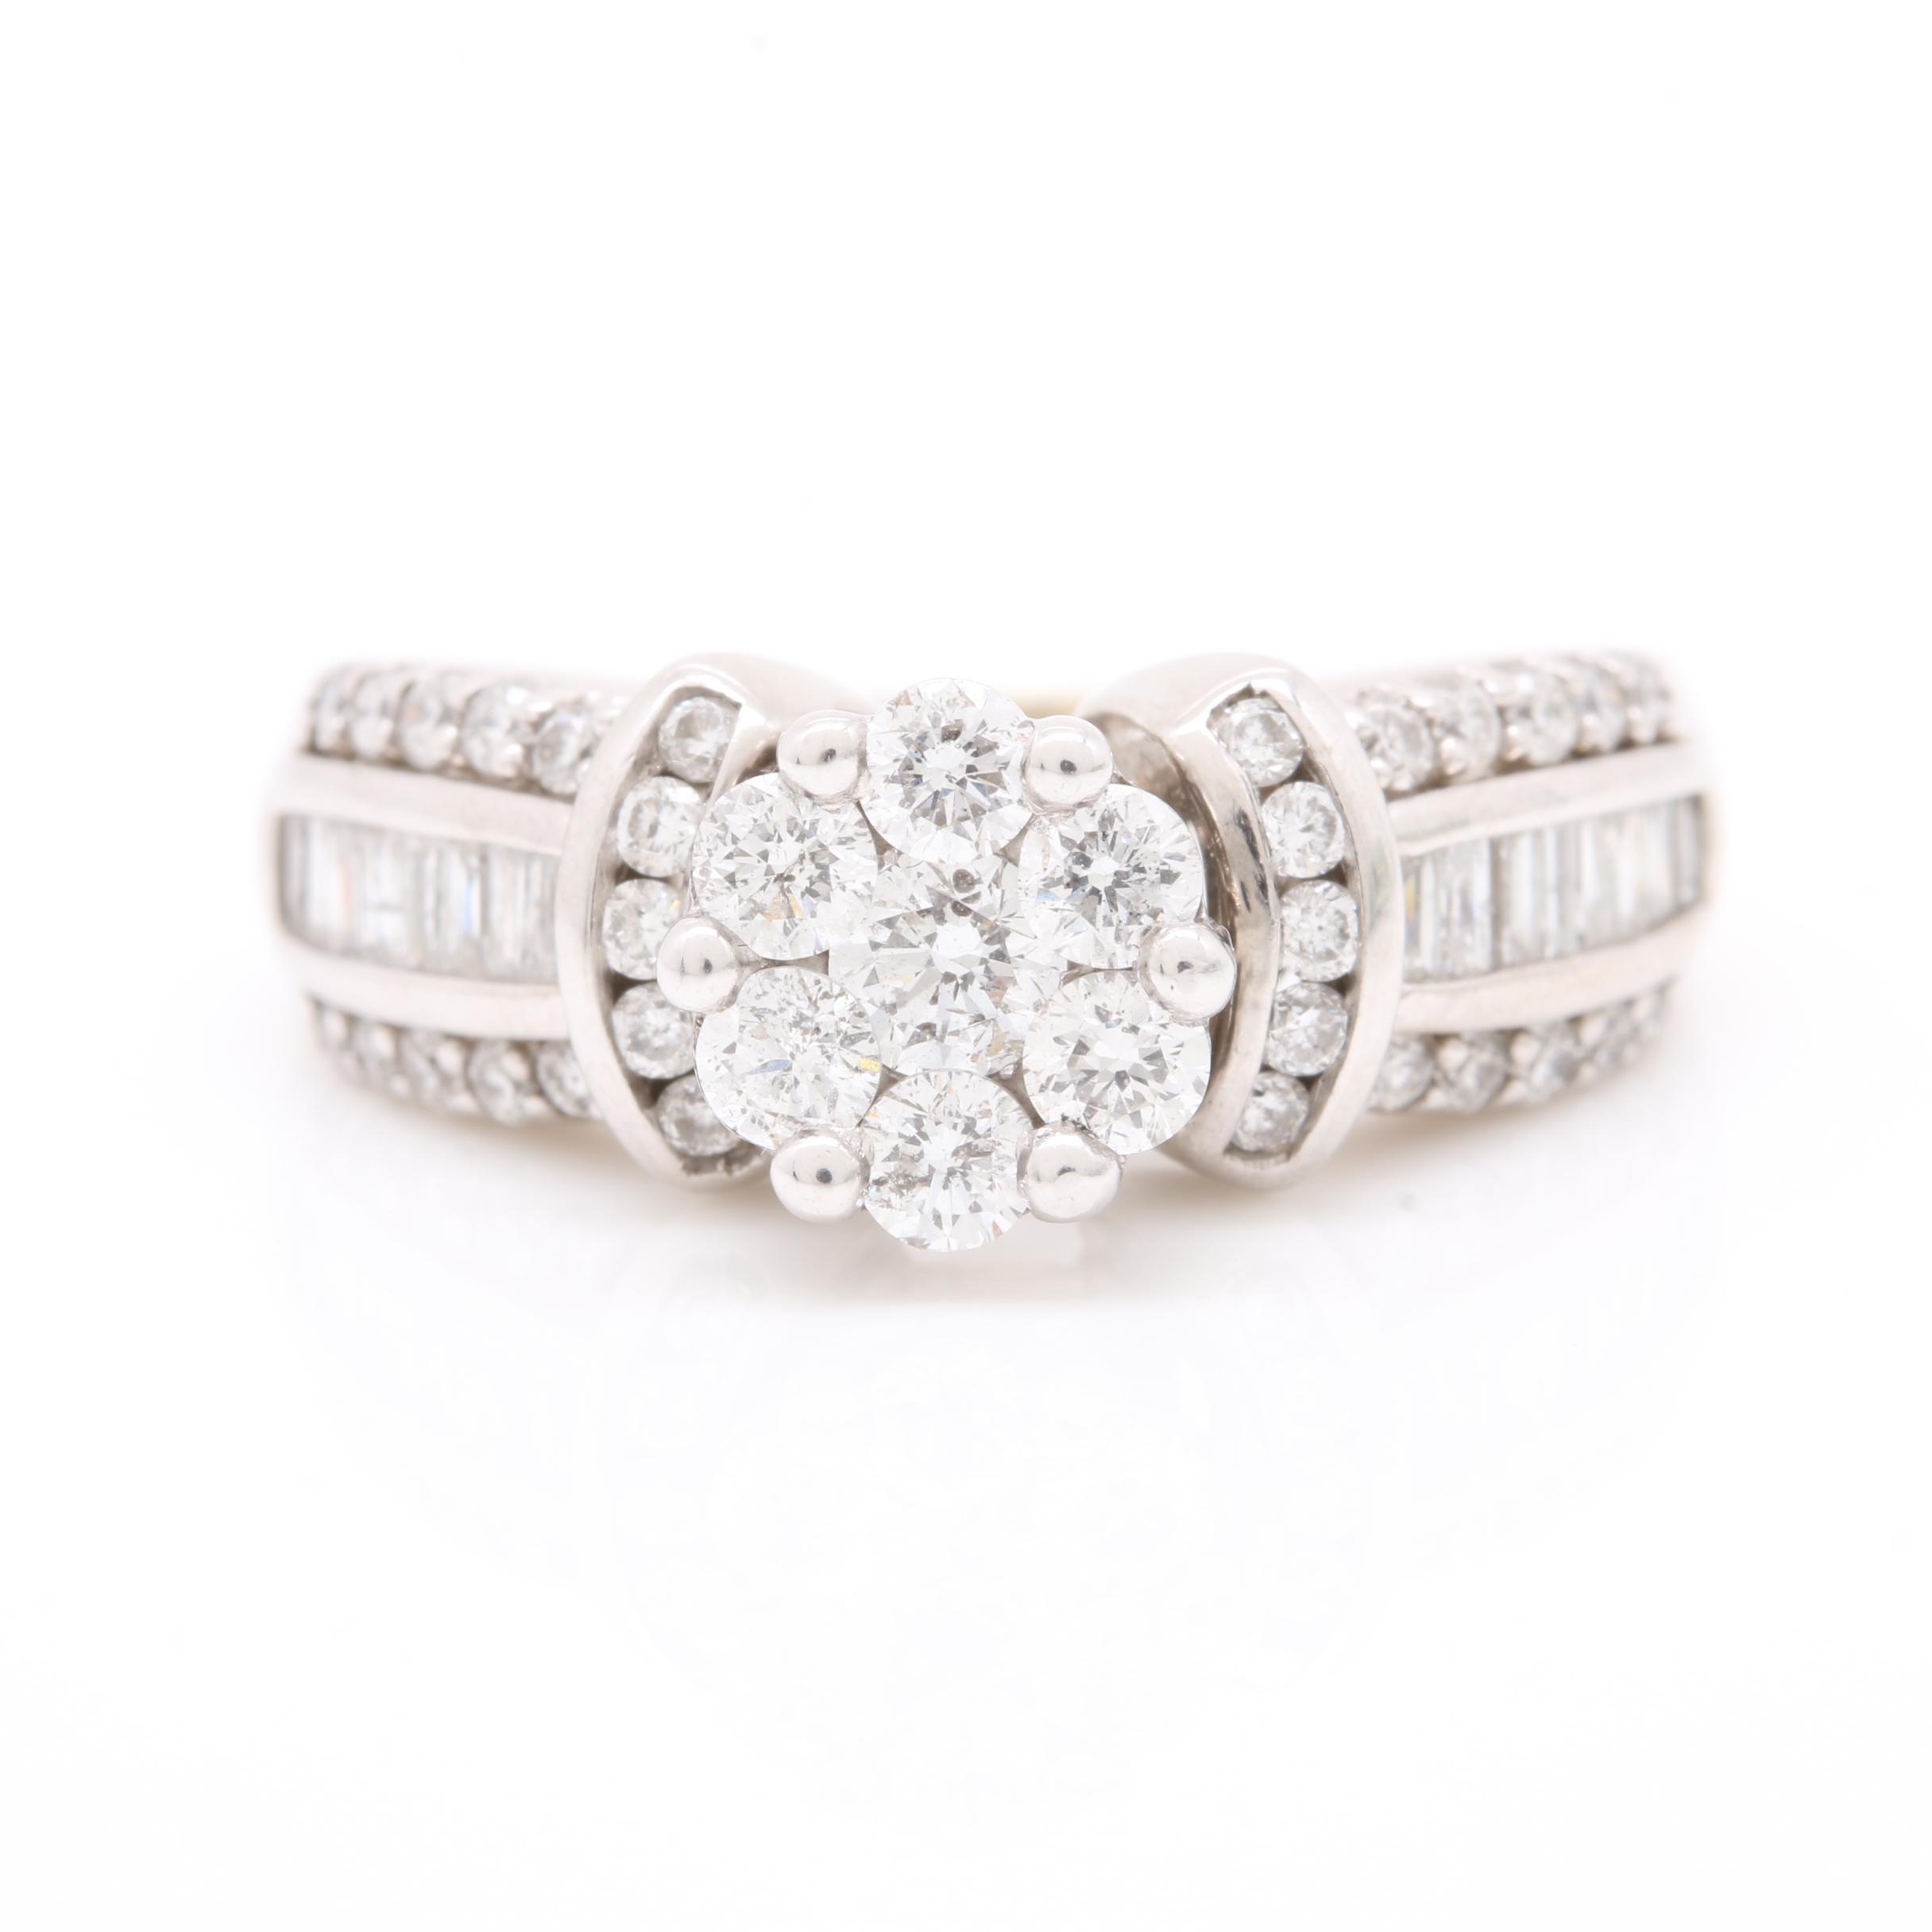 14K White Gold 1.46 CTW Diamond Ring